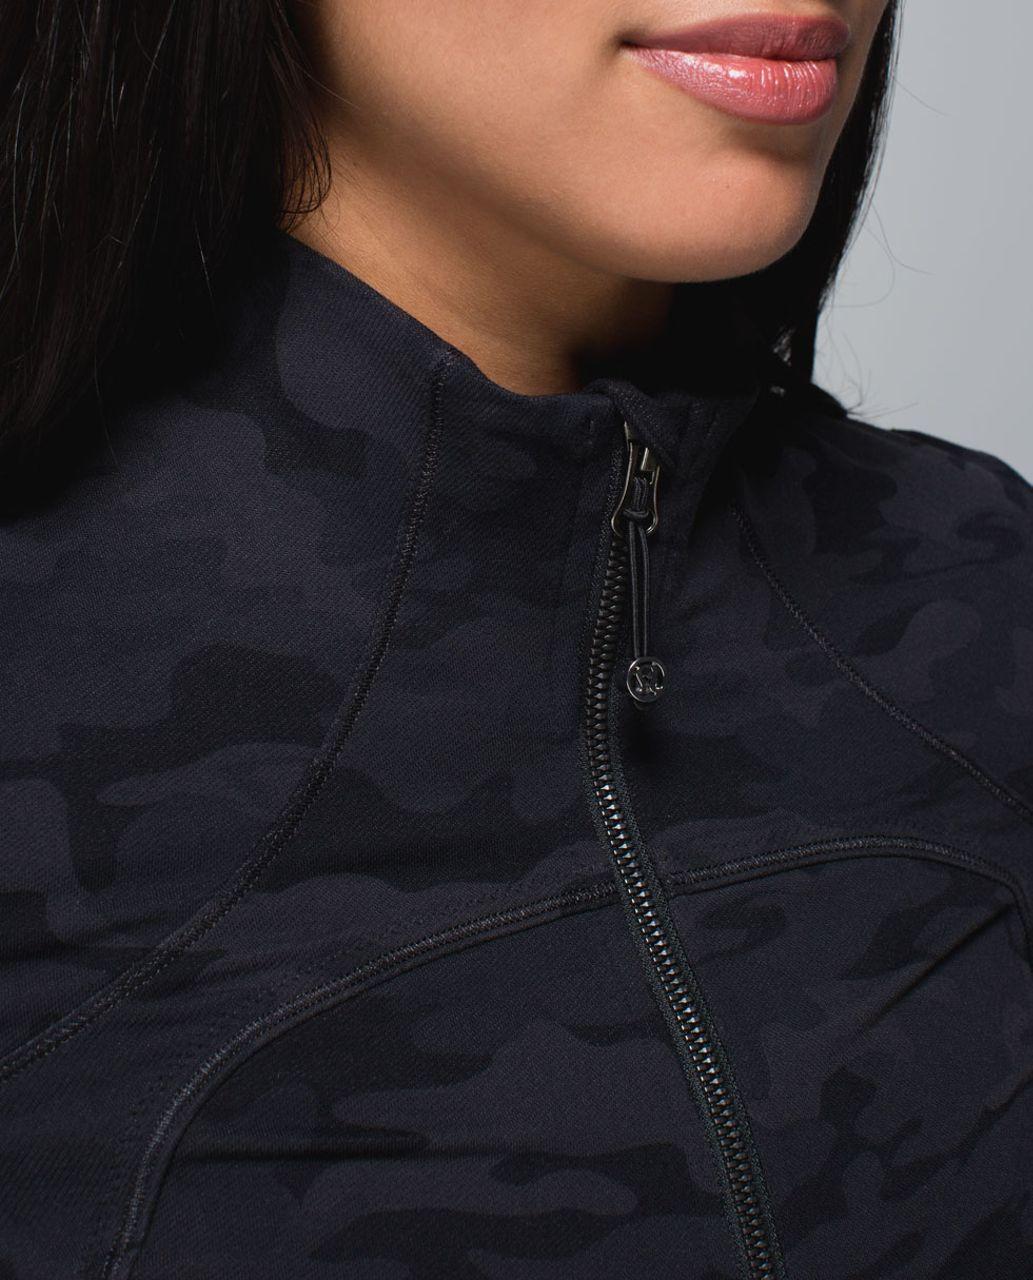 Lululemon Forme Jacket *Cuffins - Savasana Camo 20cm New Black / Soot